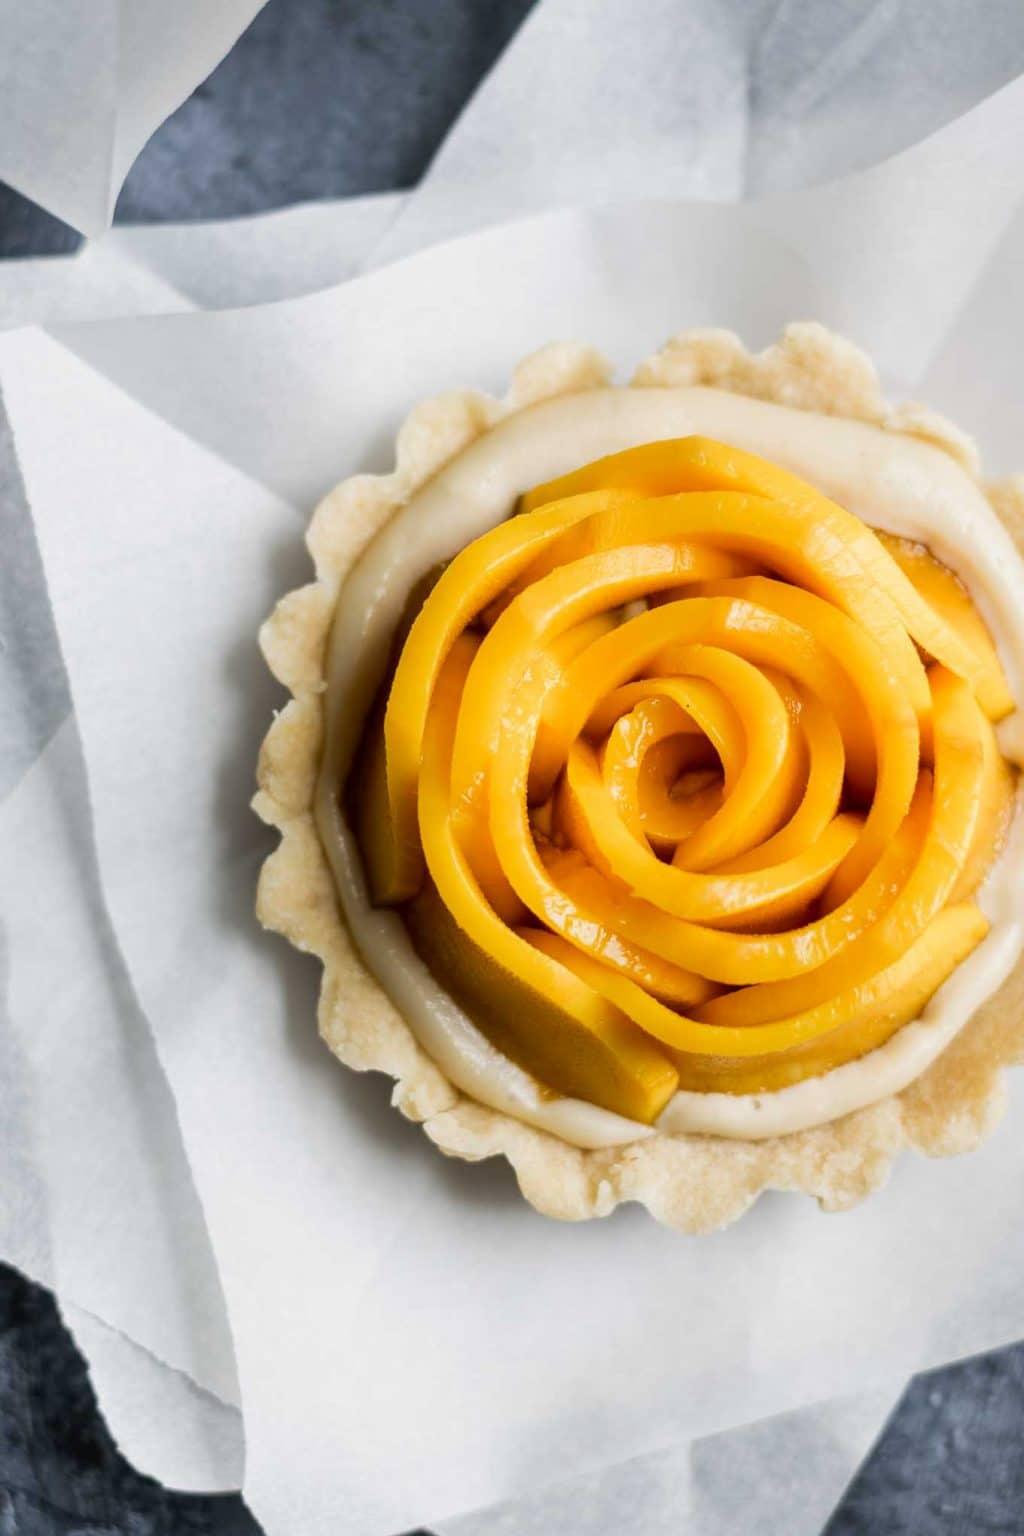 vegan mango tarts with vanilla pastry cream and shortbread crust. Mangoes are cut into rosettes.